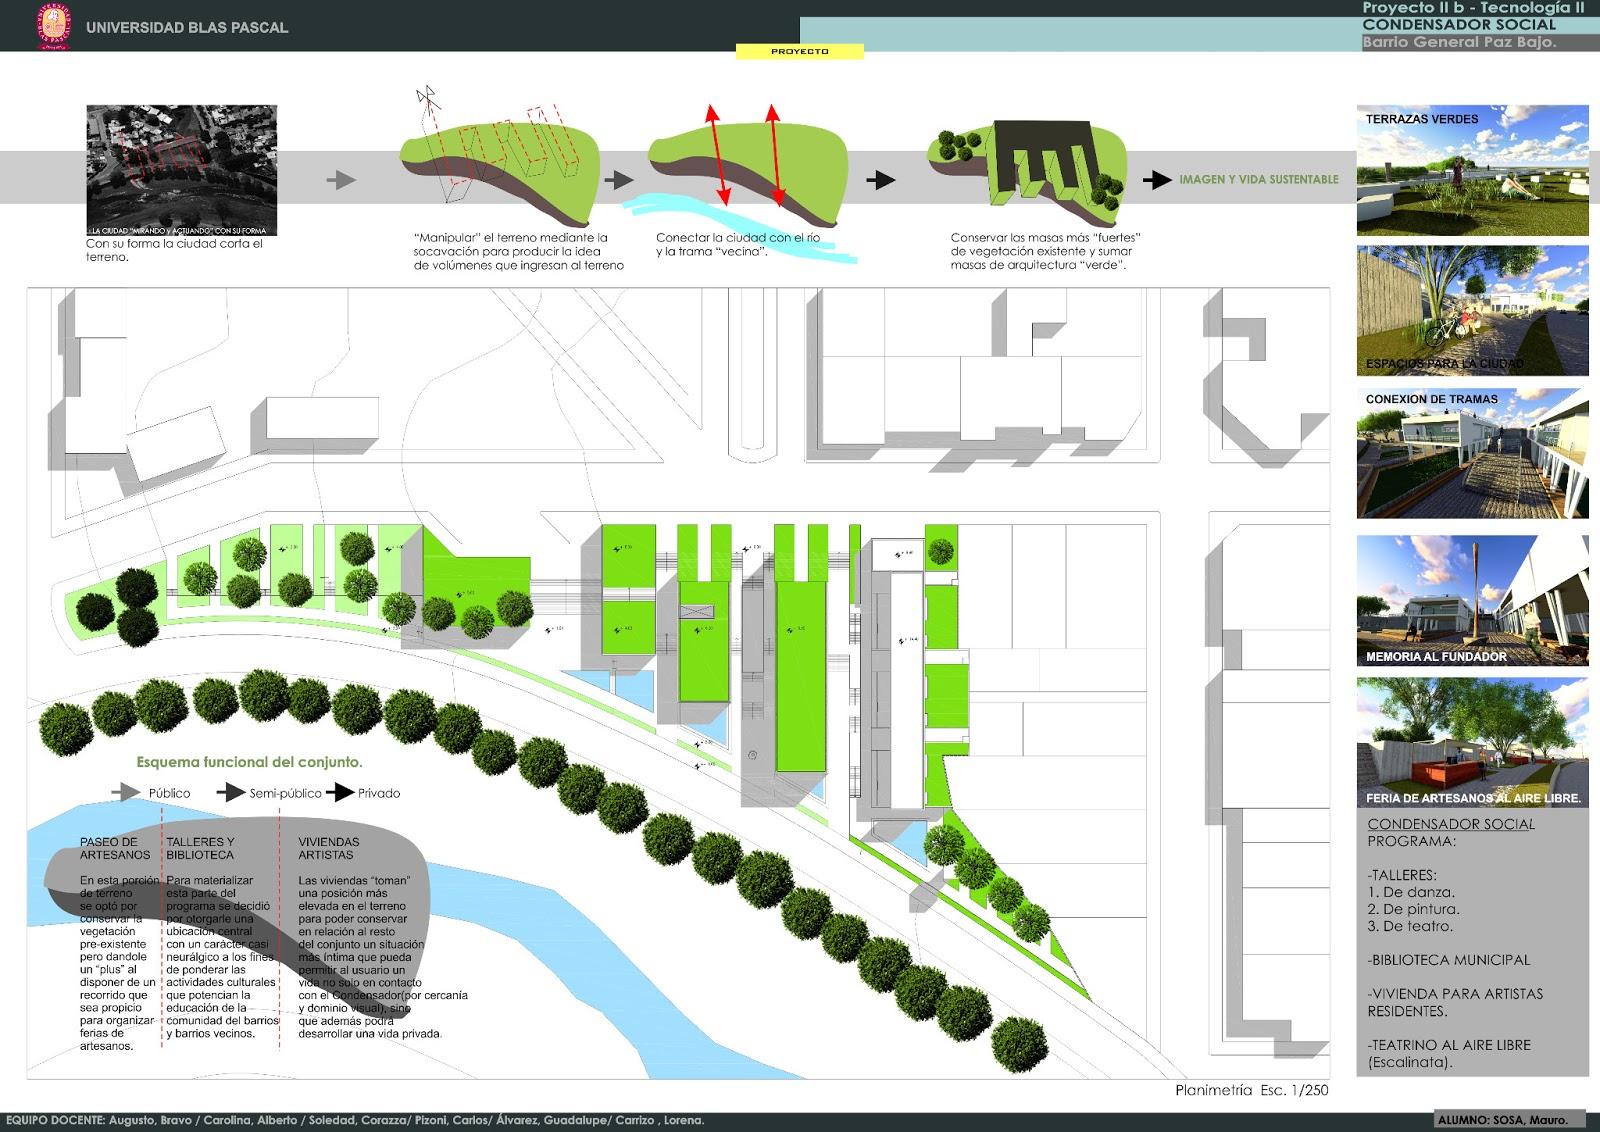 Blog de arquitectura condensador social barrio general for Blog de arquitectura